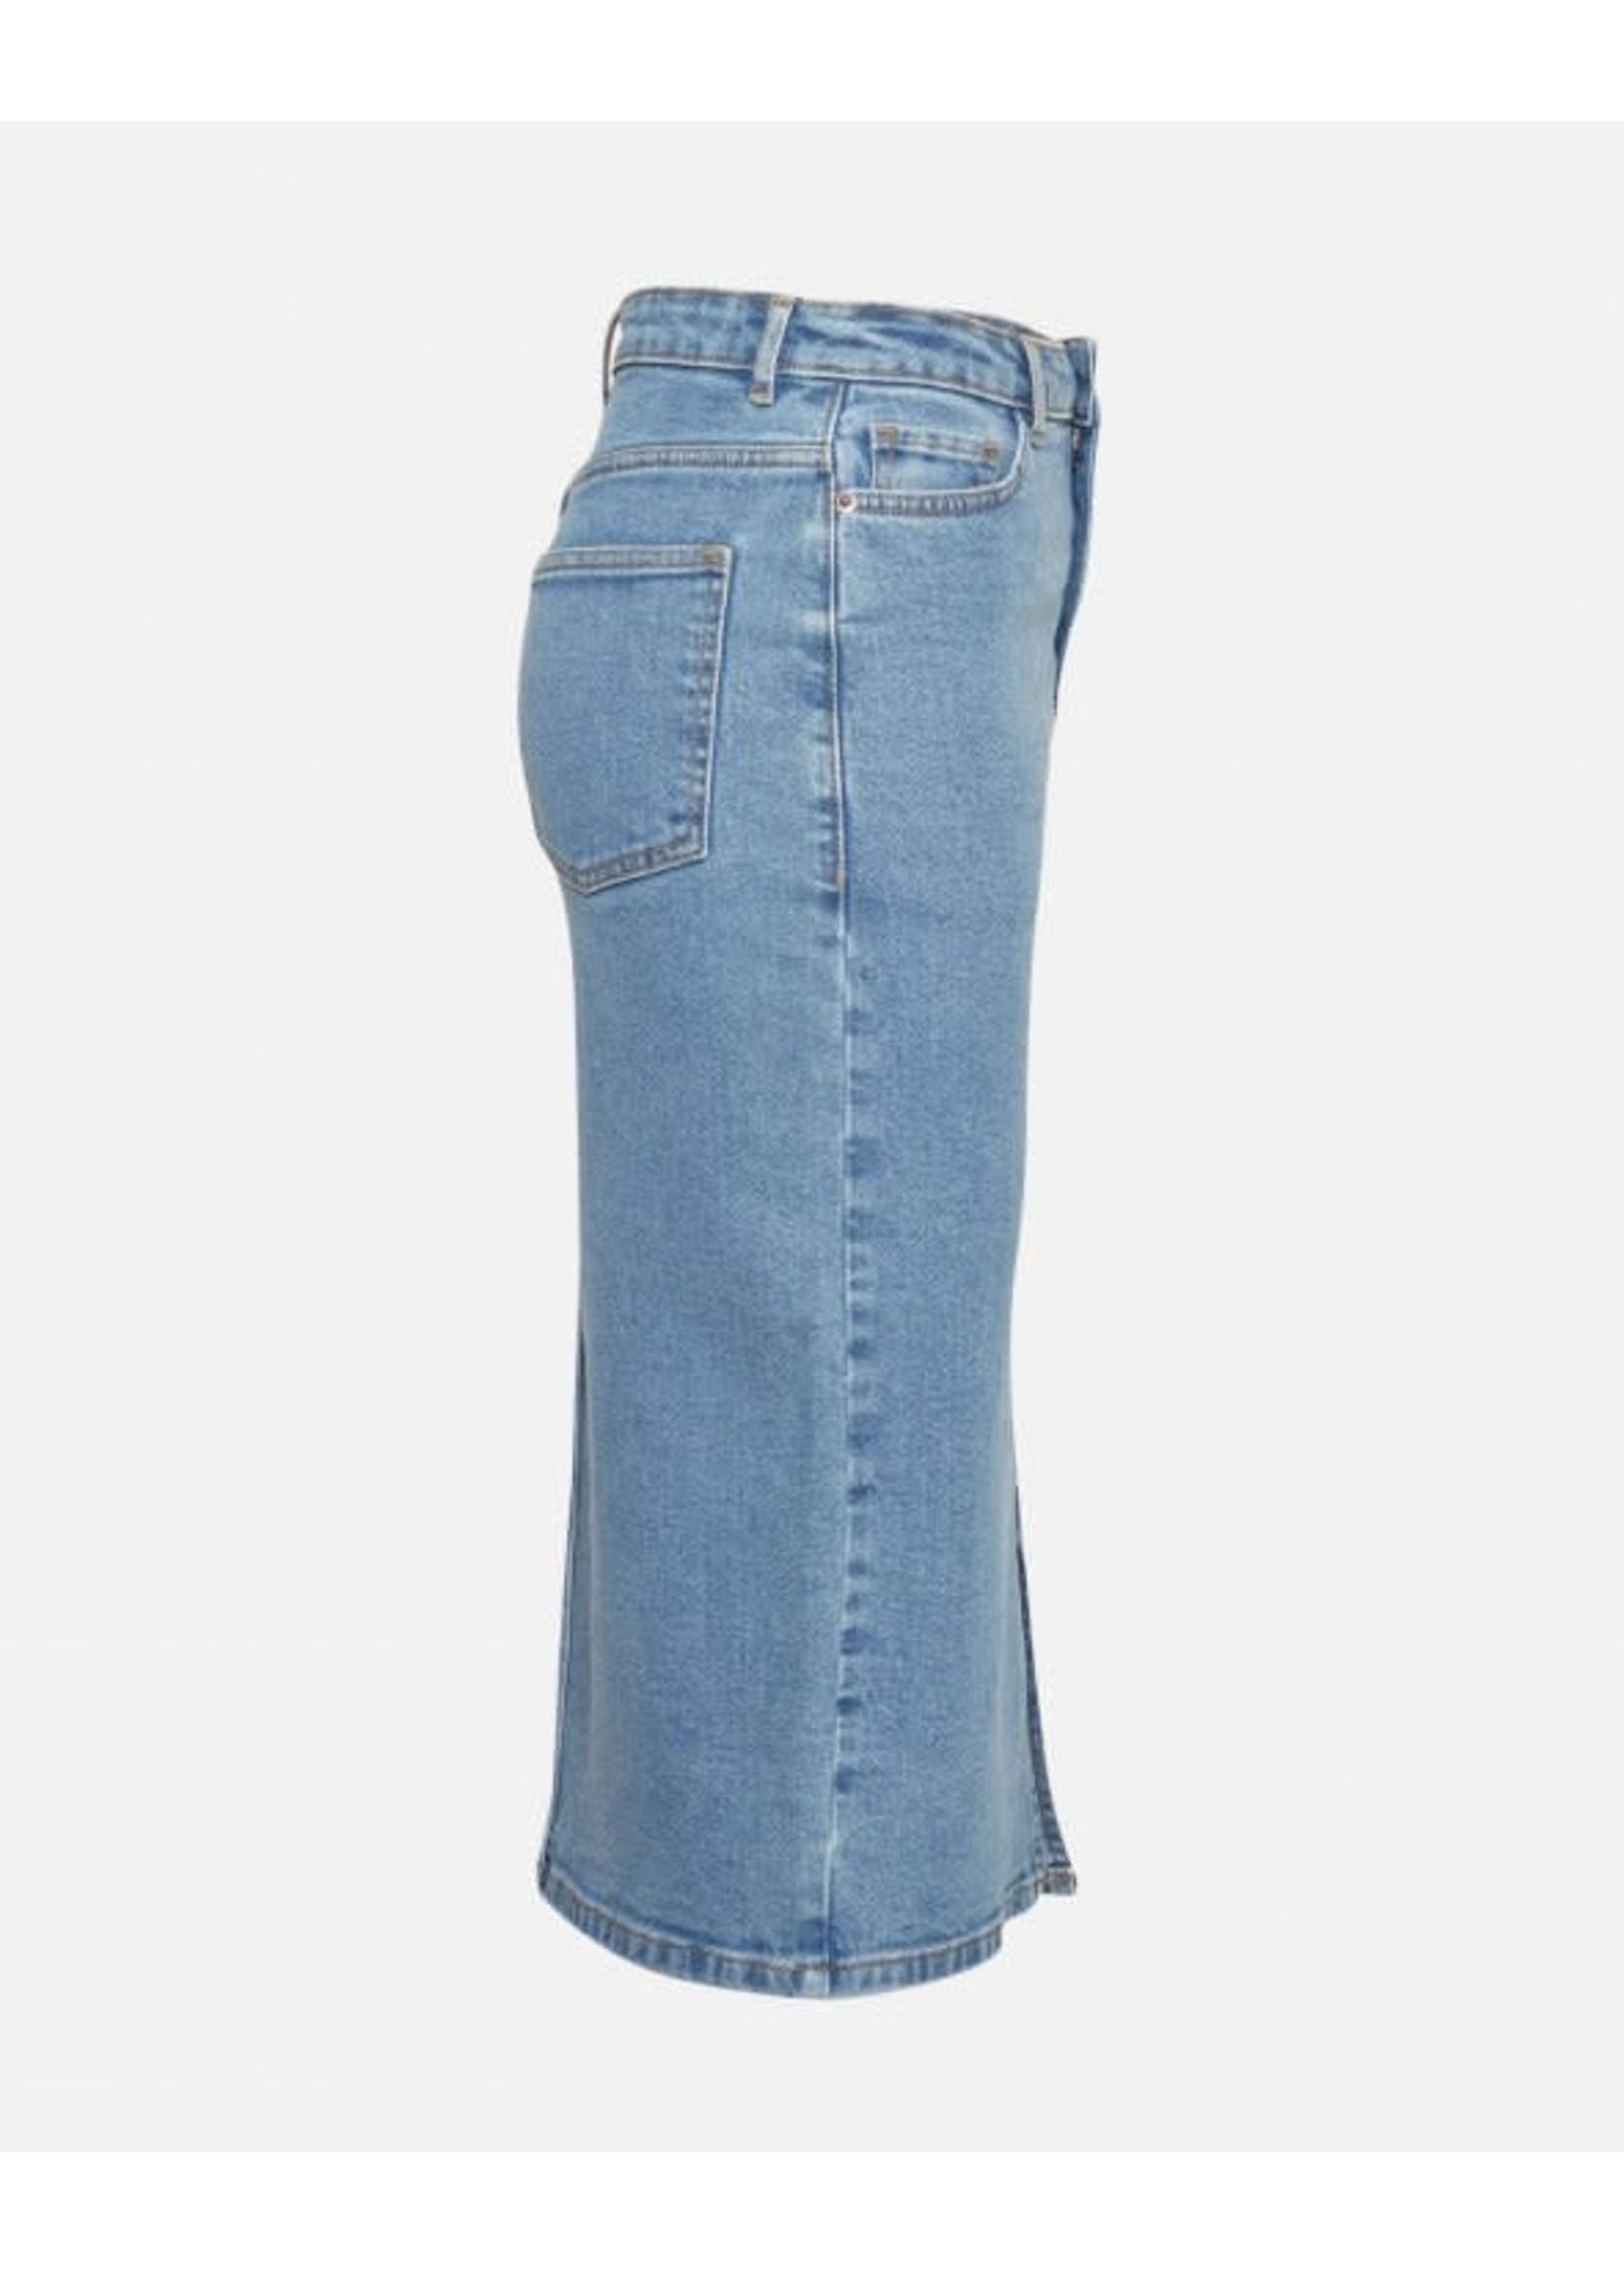 MSCH Calissa Rikka Denim Skirt Vintage blue